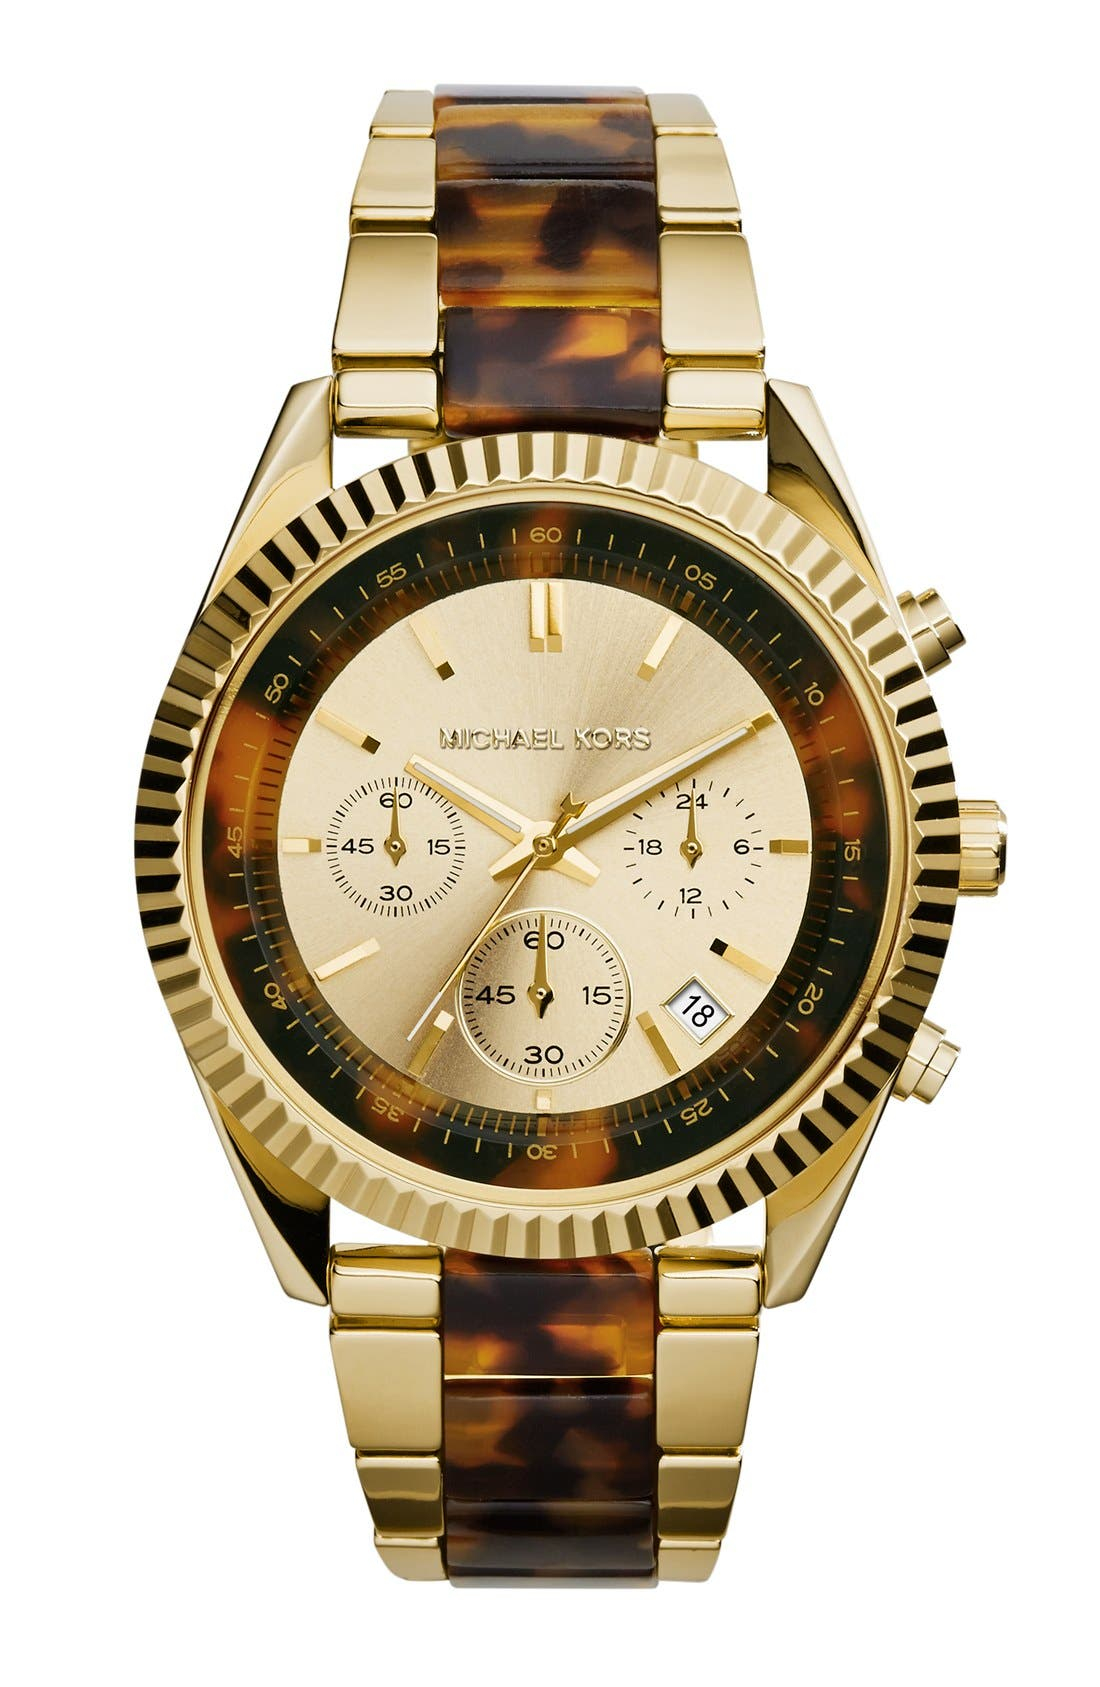 Main Image - Michael Kors 'Clarkson' Chronograph Acetate Link Bracelet Watch, 42mm